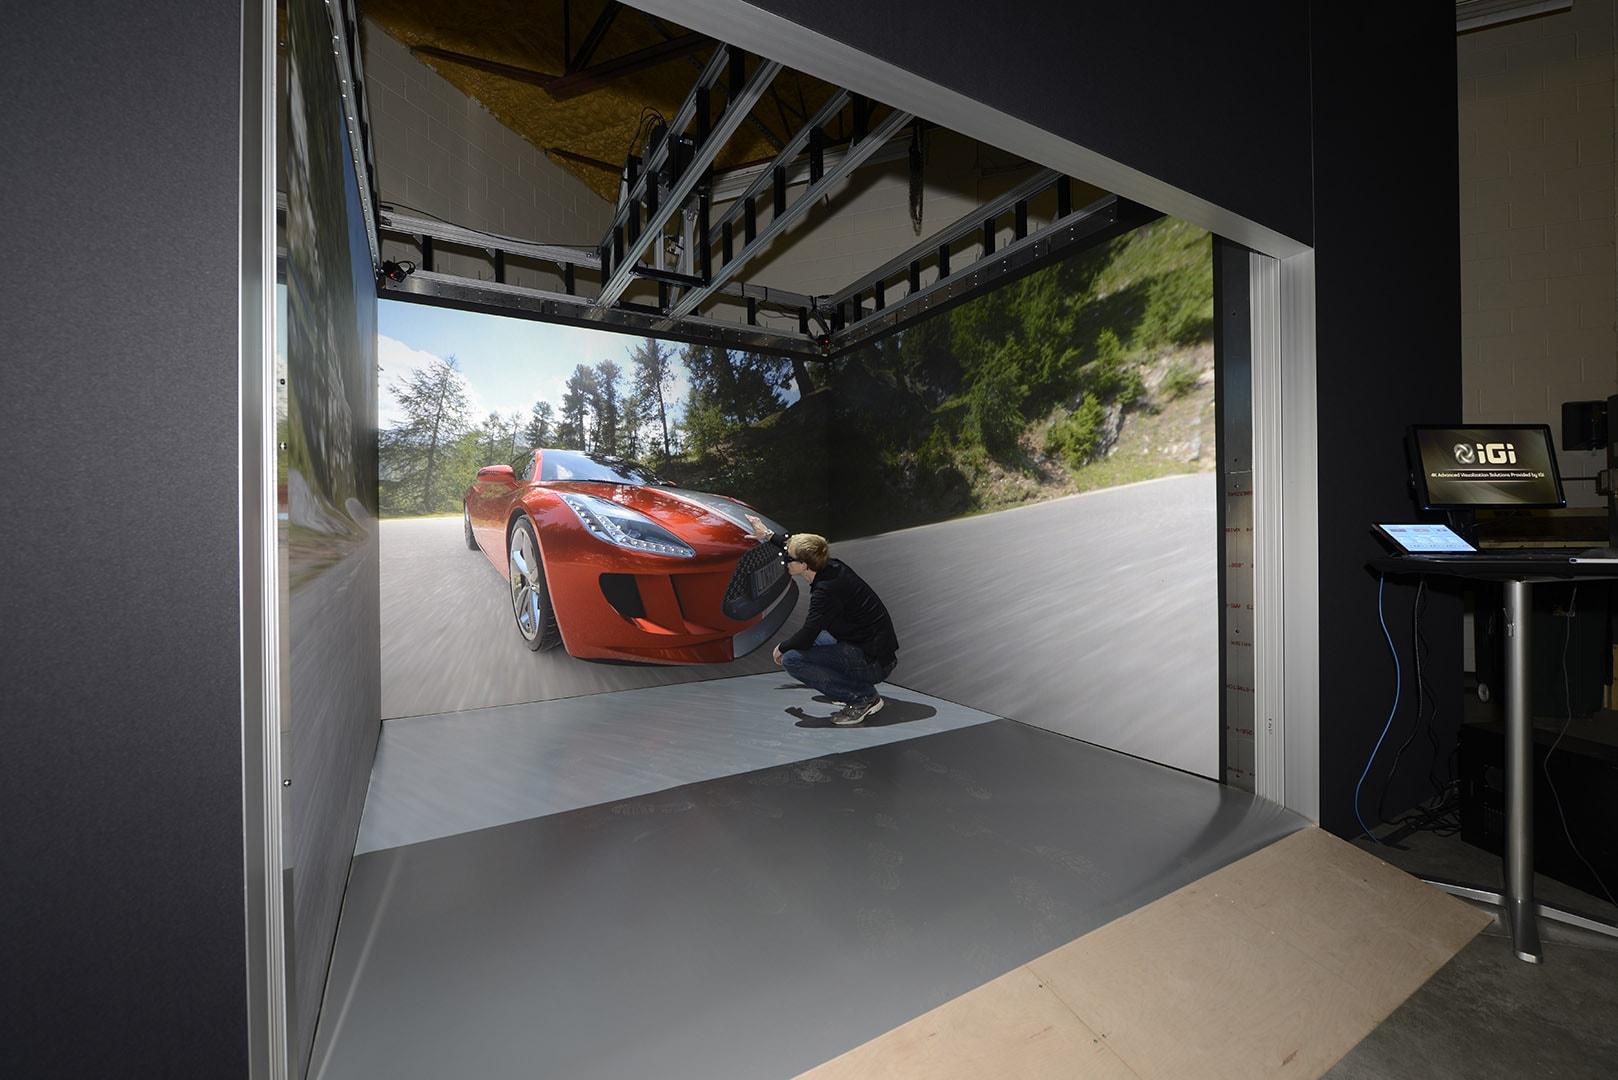 VR Room virtual reality system